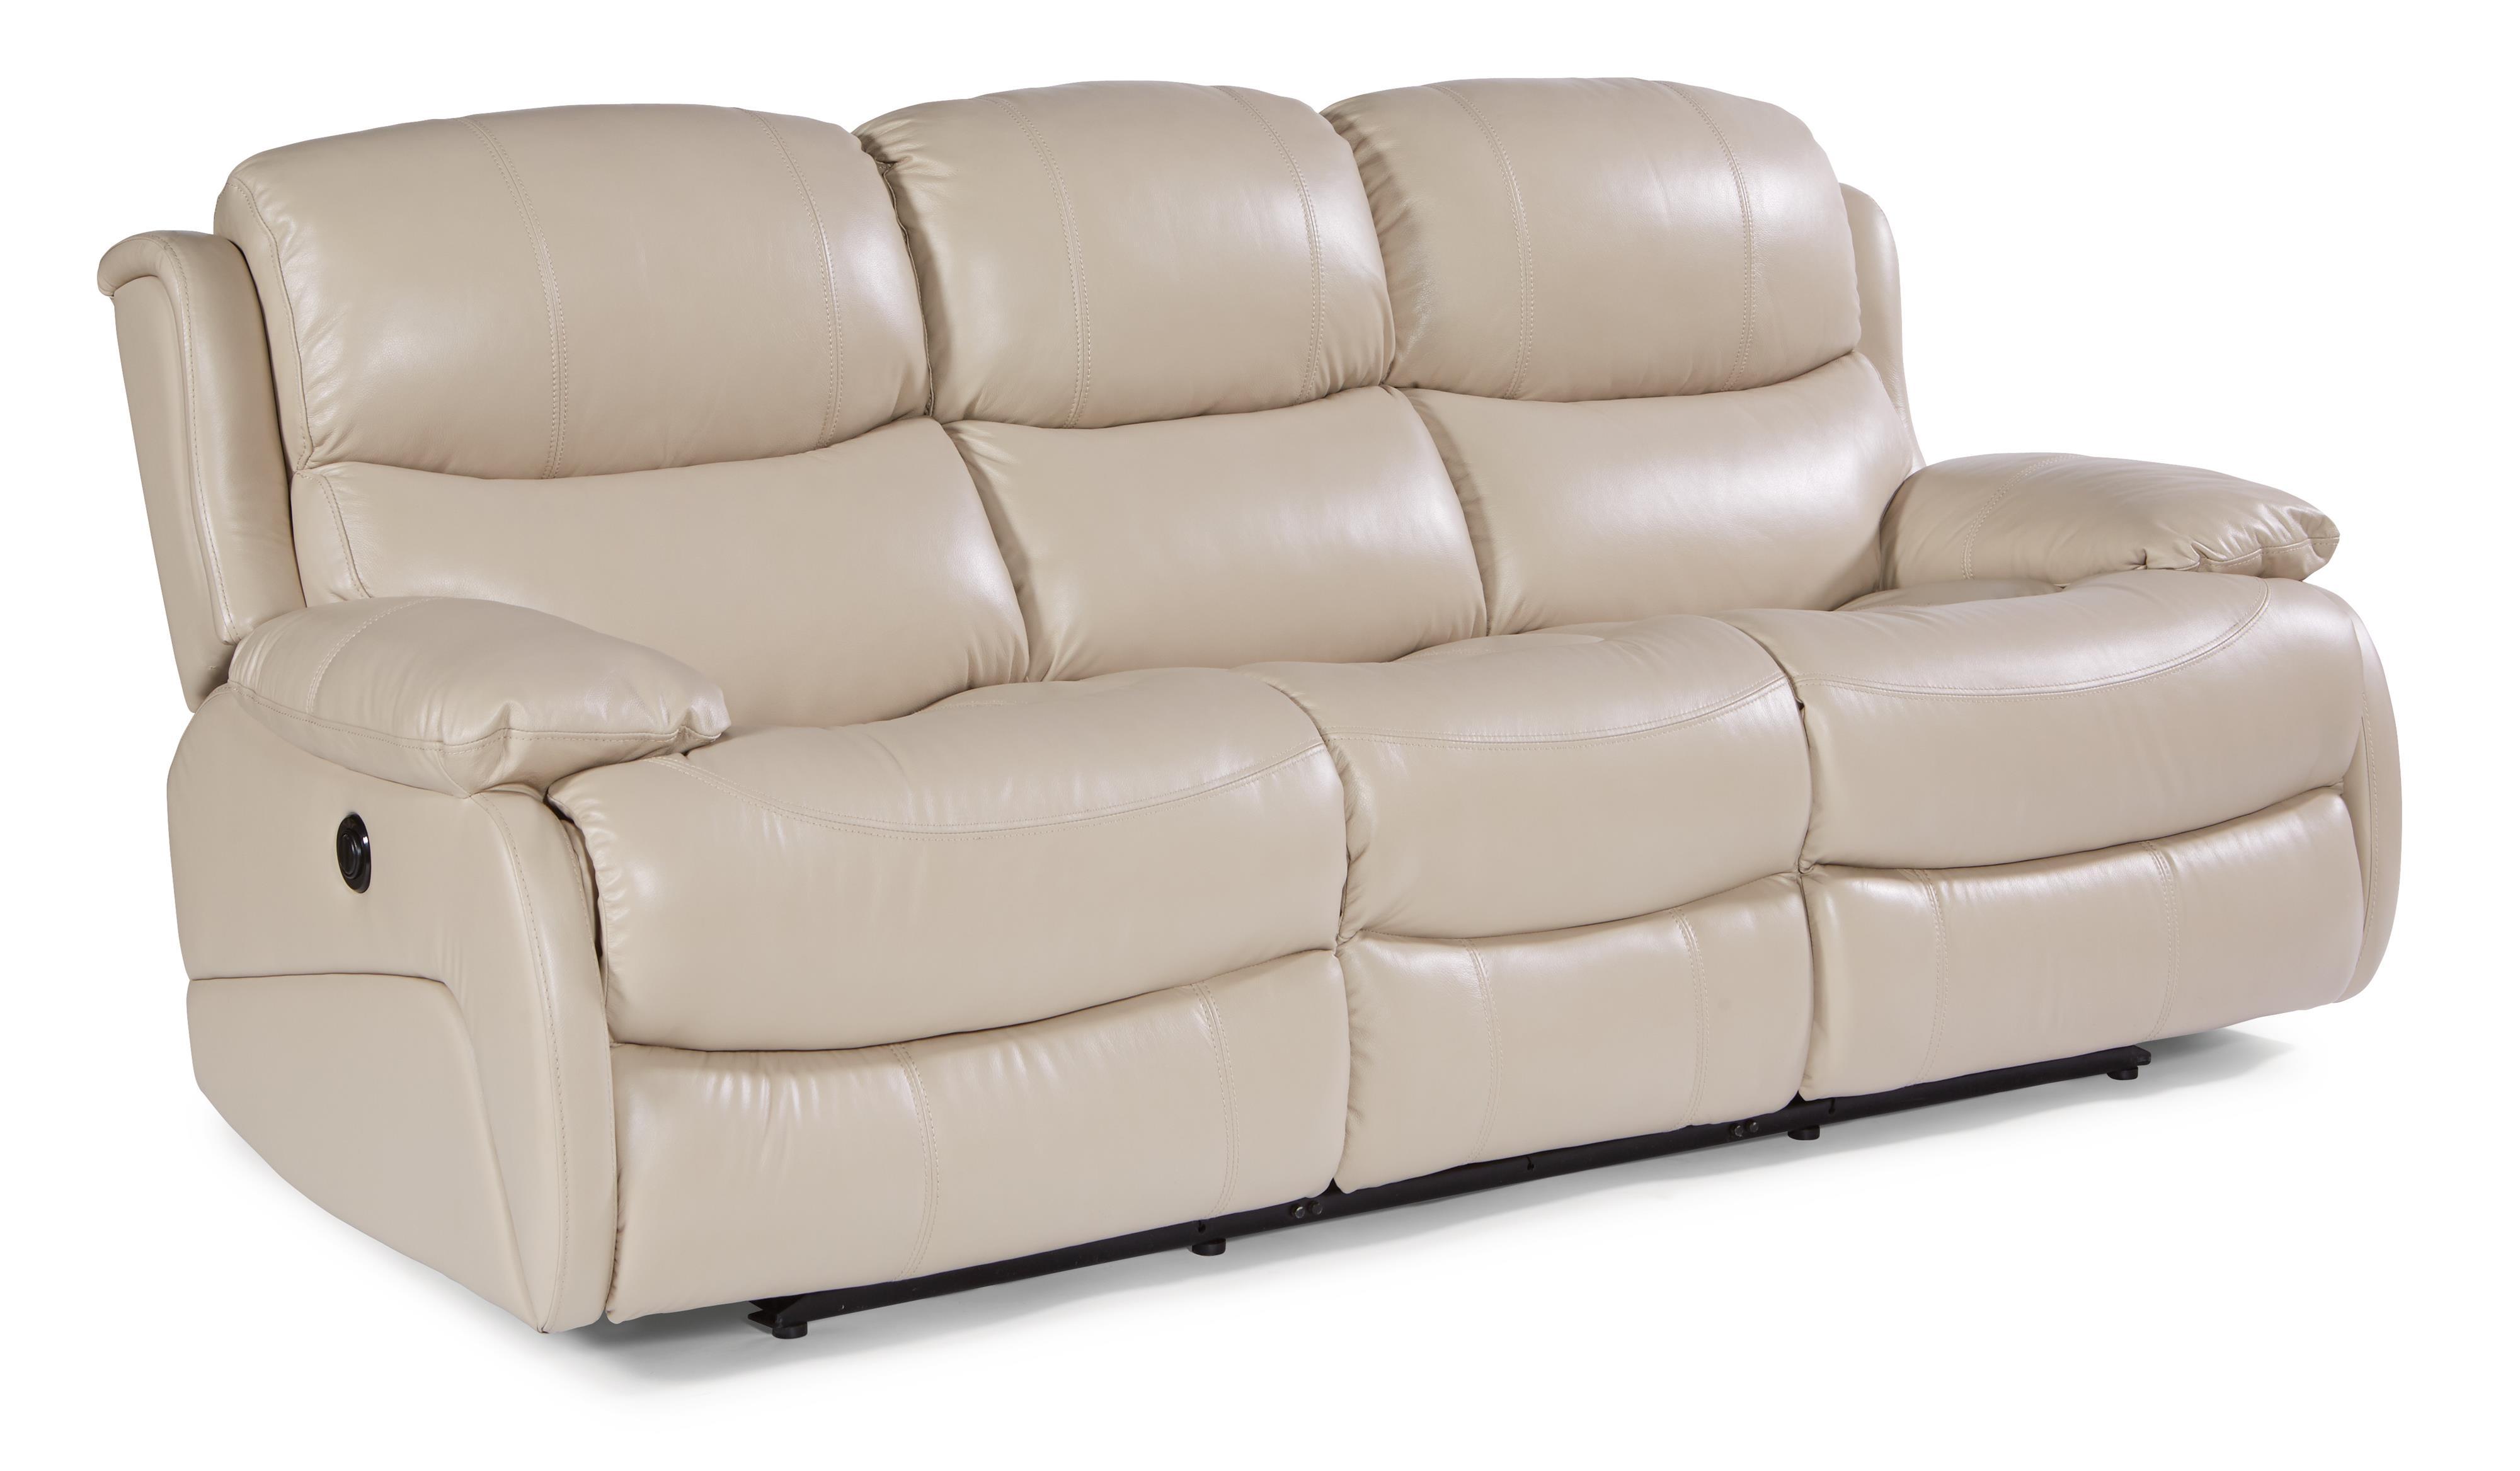 Flexsteel latitudes amsterdam power double reclining - Sofa reclinable ...